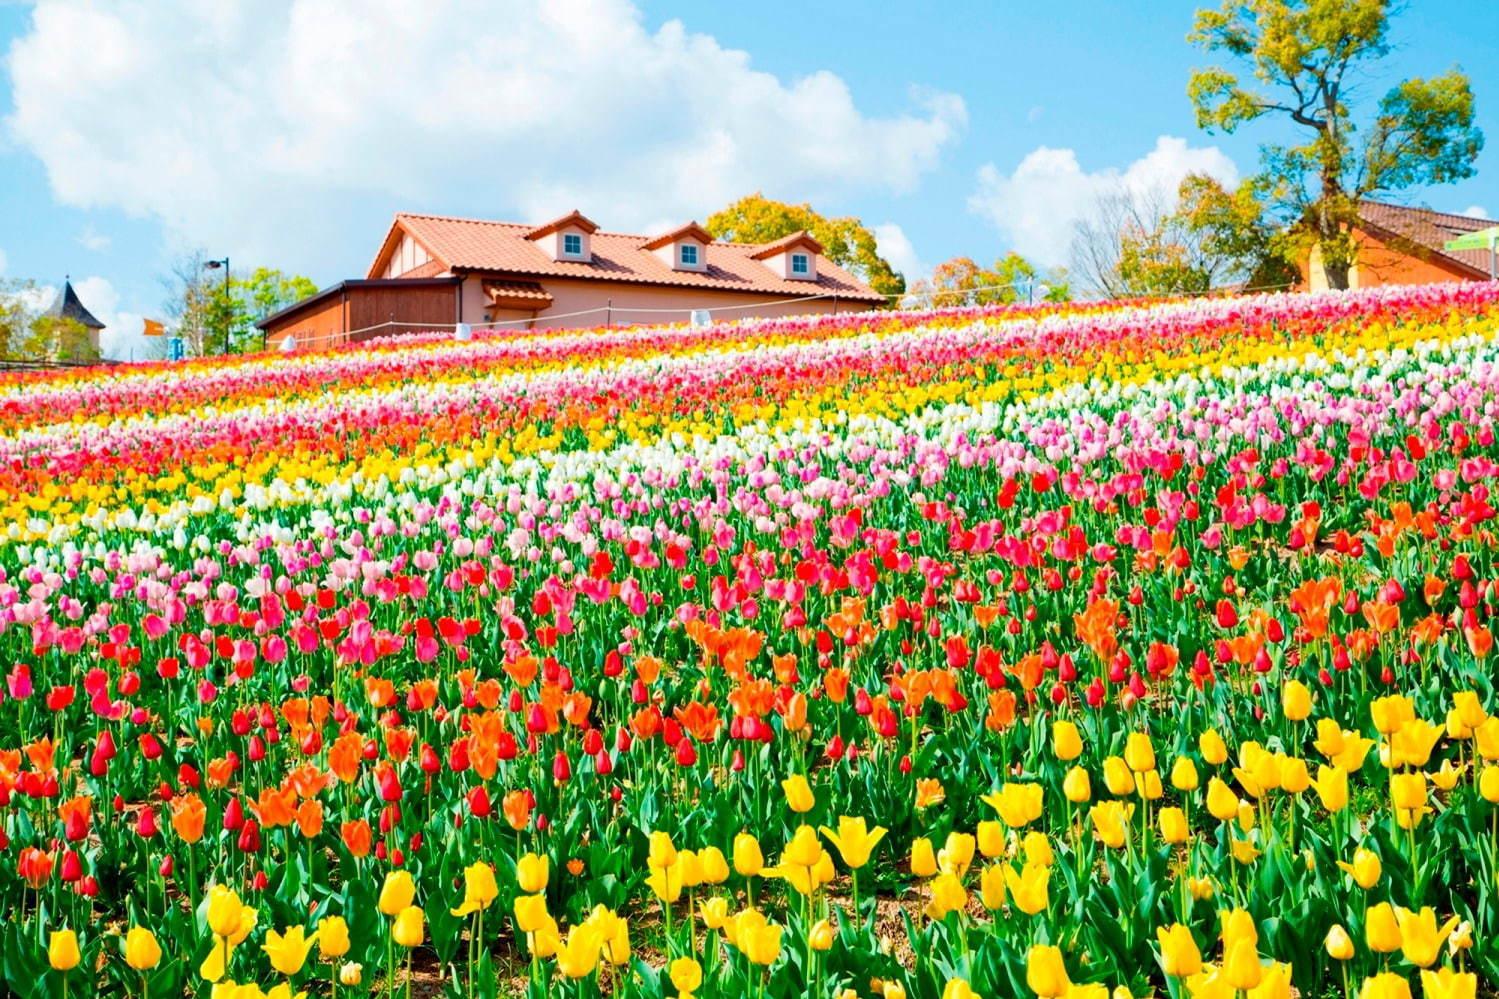 Sakai Tulip Festa 2020 at Harvest Hill inOsaka